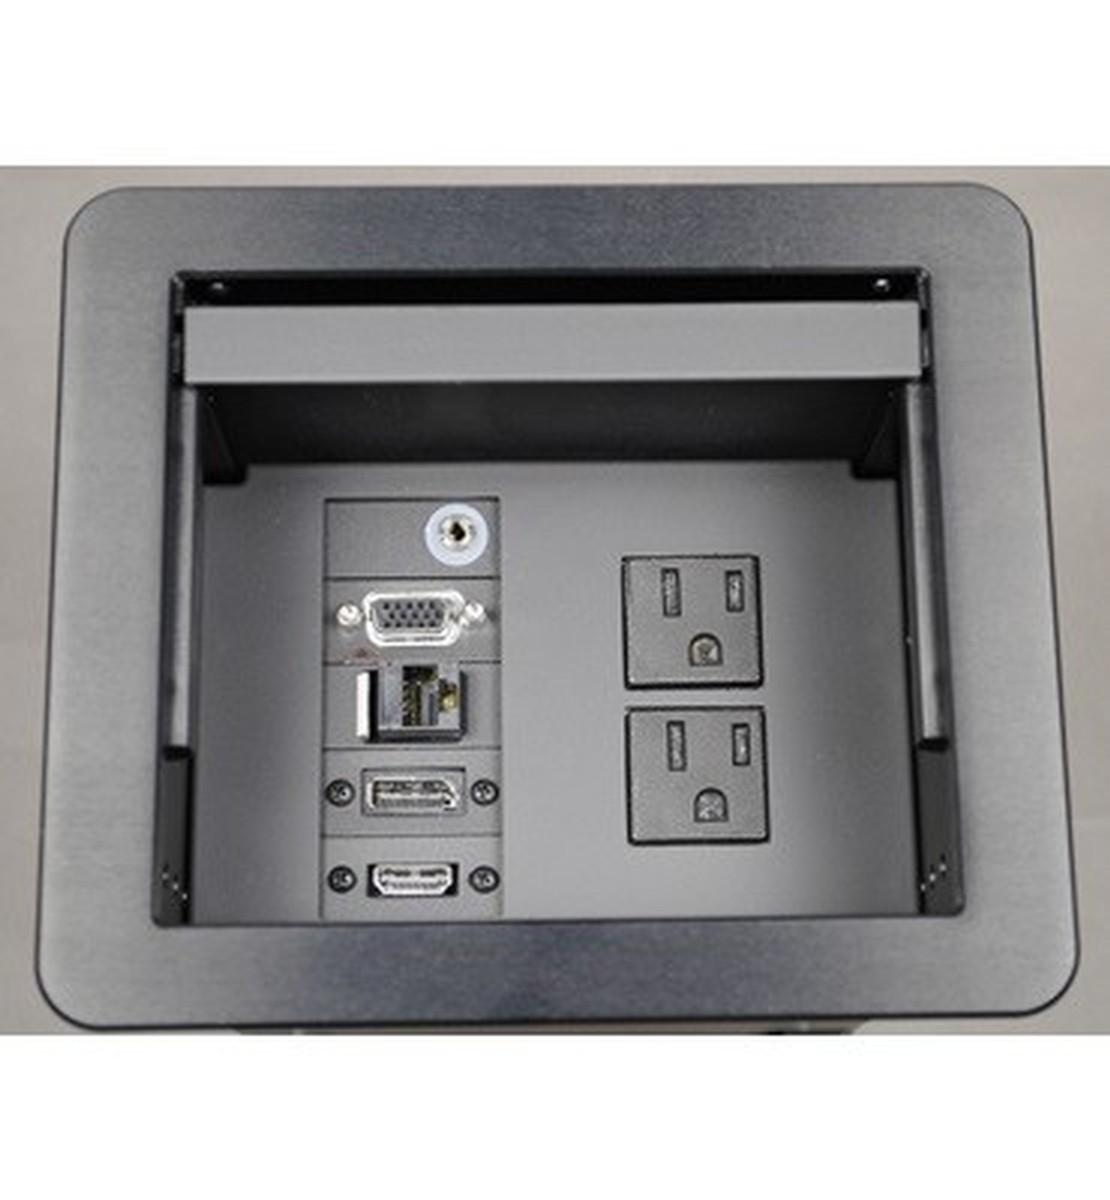 Wiremold Tb672apbk Kit1 Table Box W Power Hdmi Vga